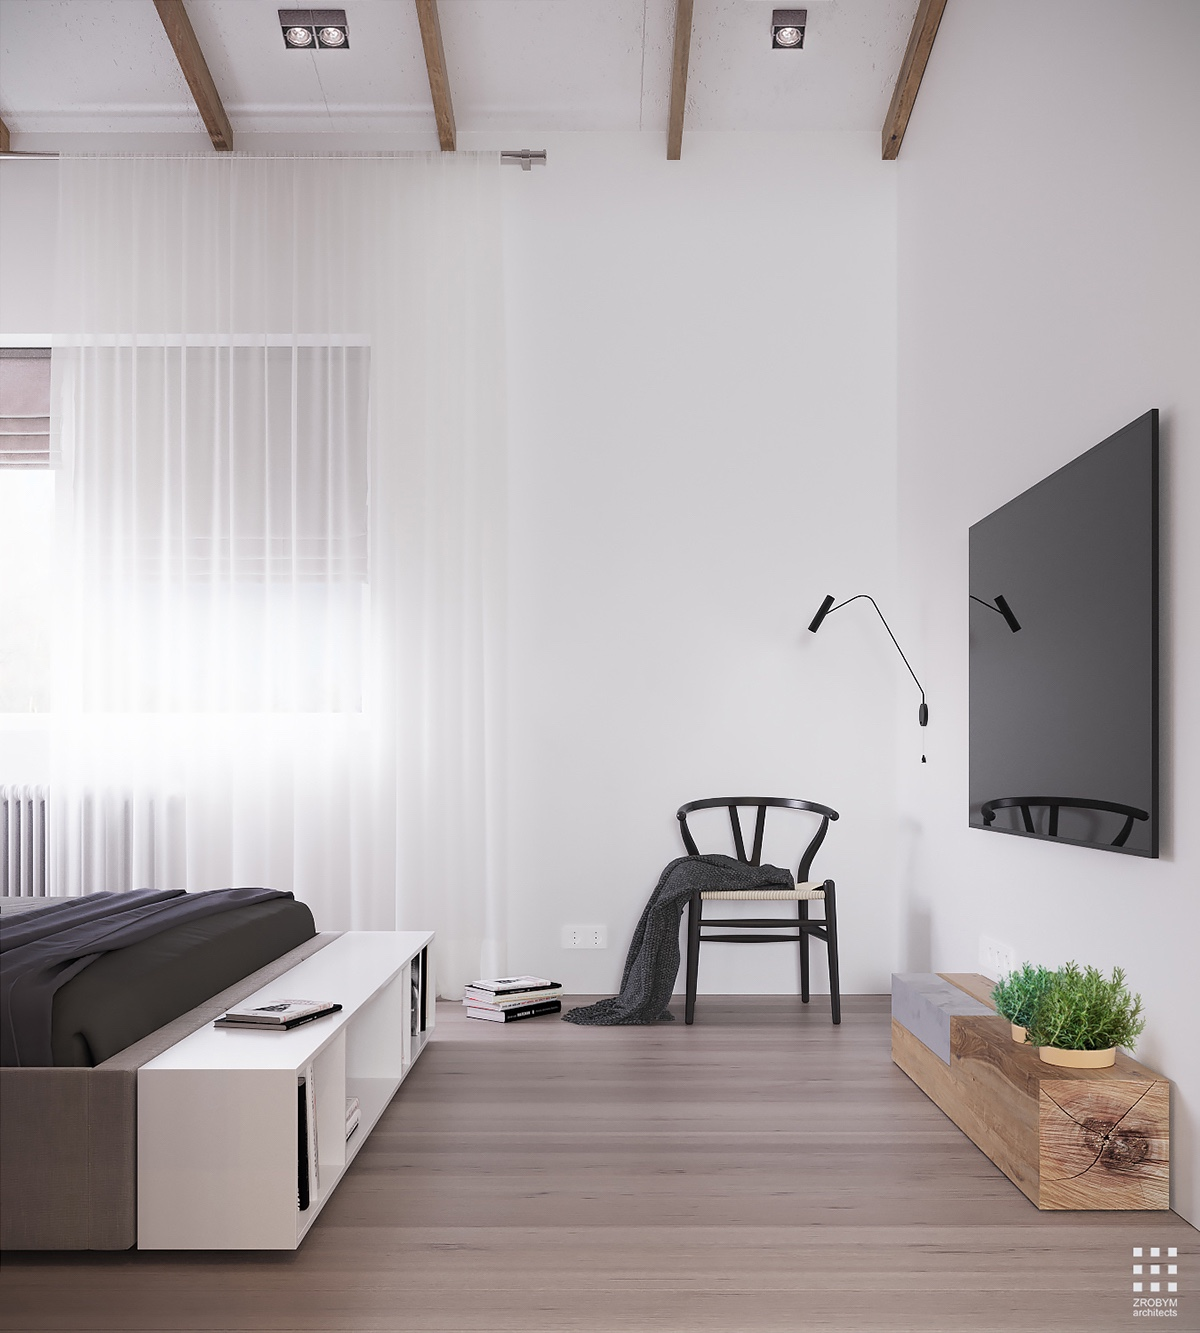 Minimalist Bedroom: An Organic Modern Home With Subtle Industrial Undertones